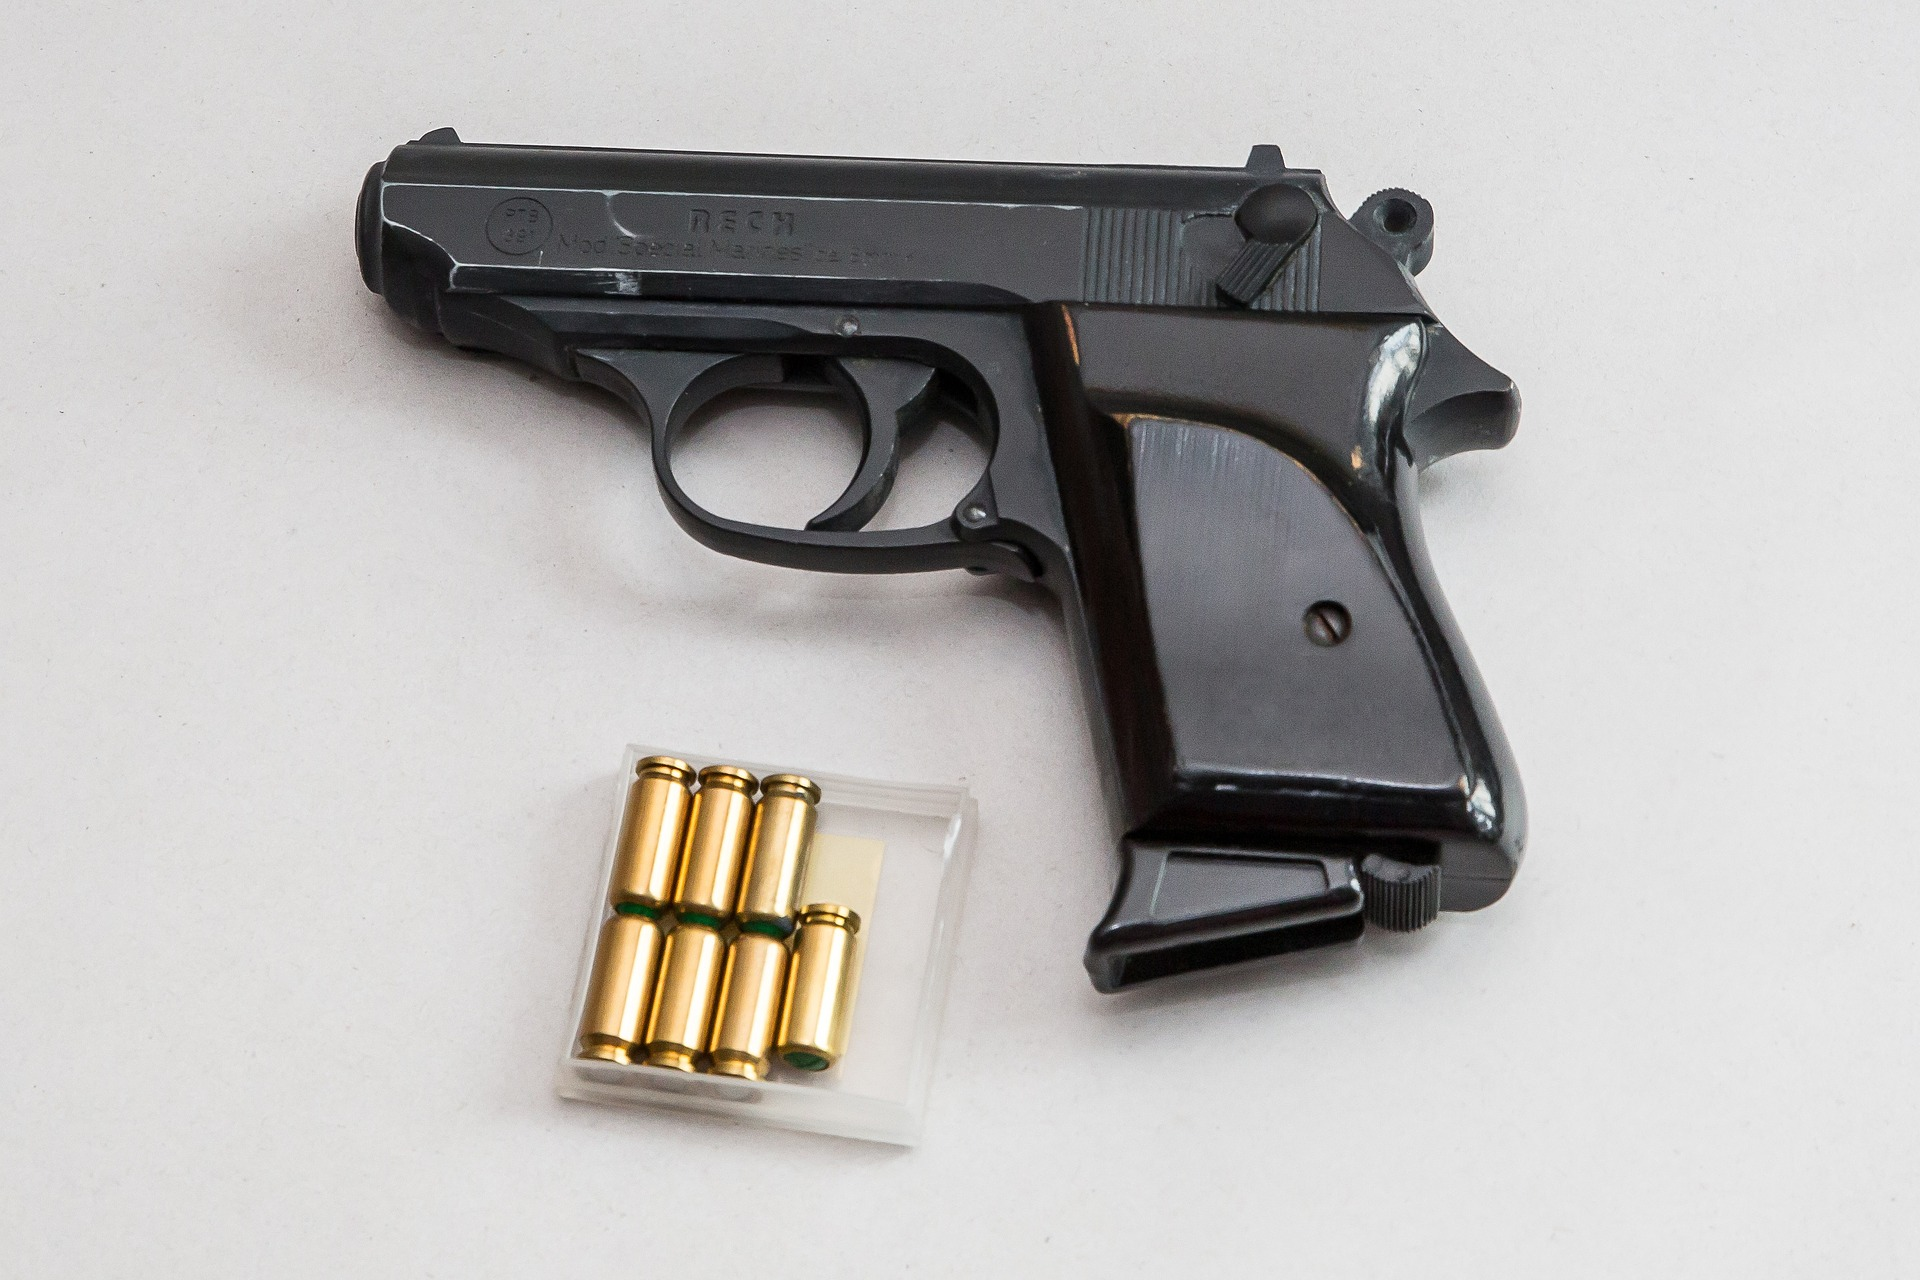 Blank guns under $100